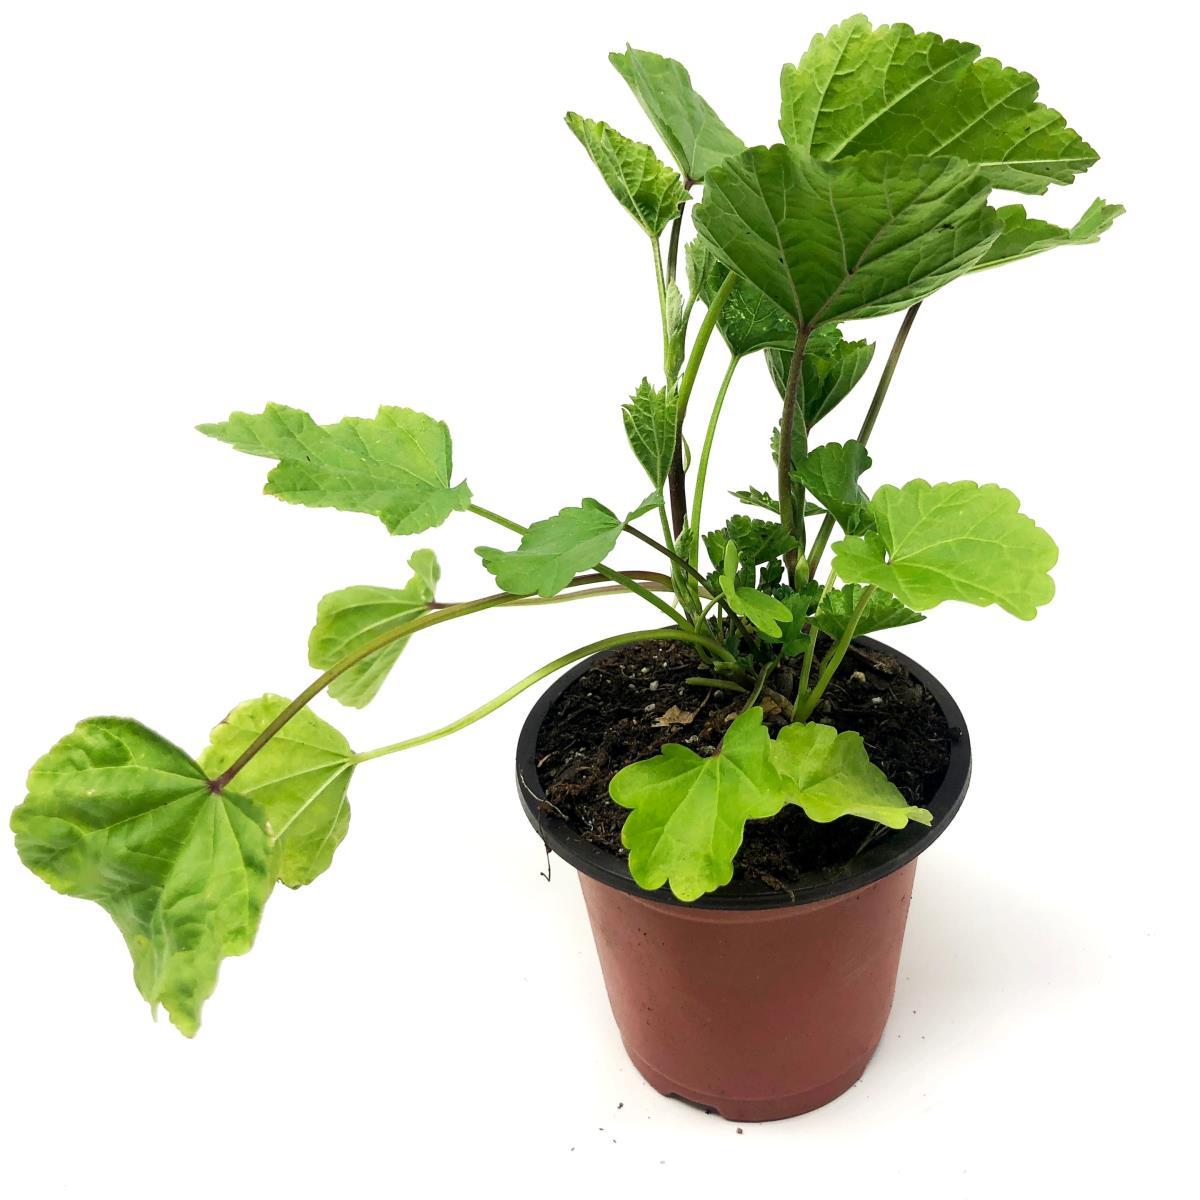 Marshmallow - Live Plant